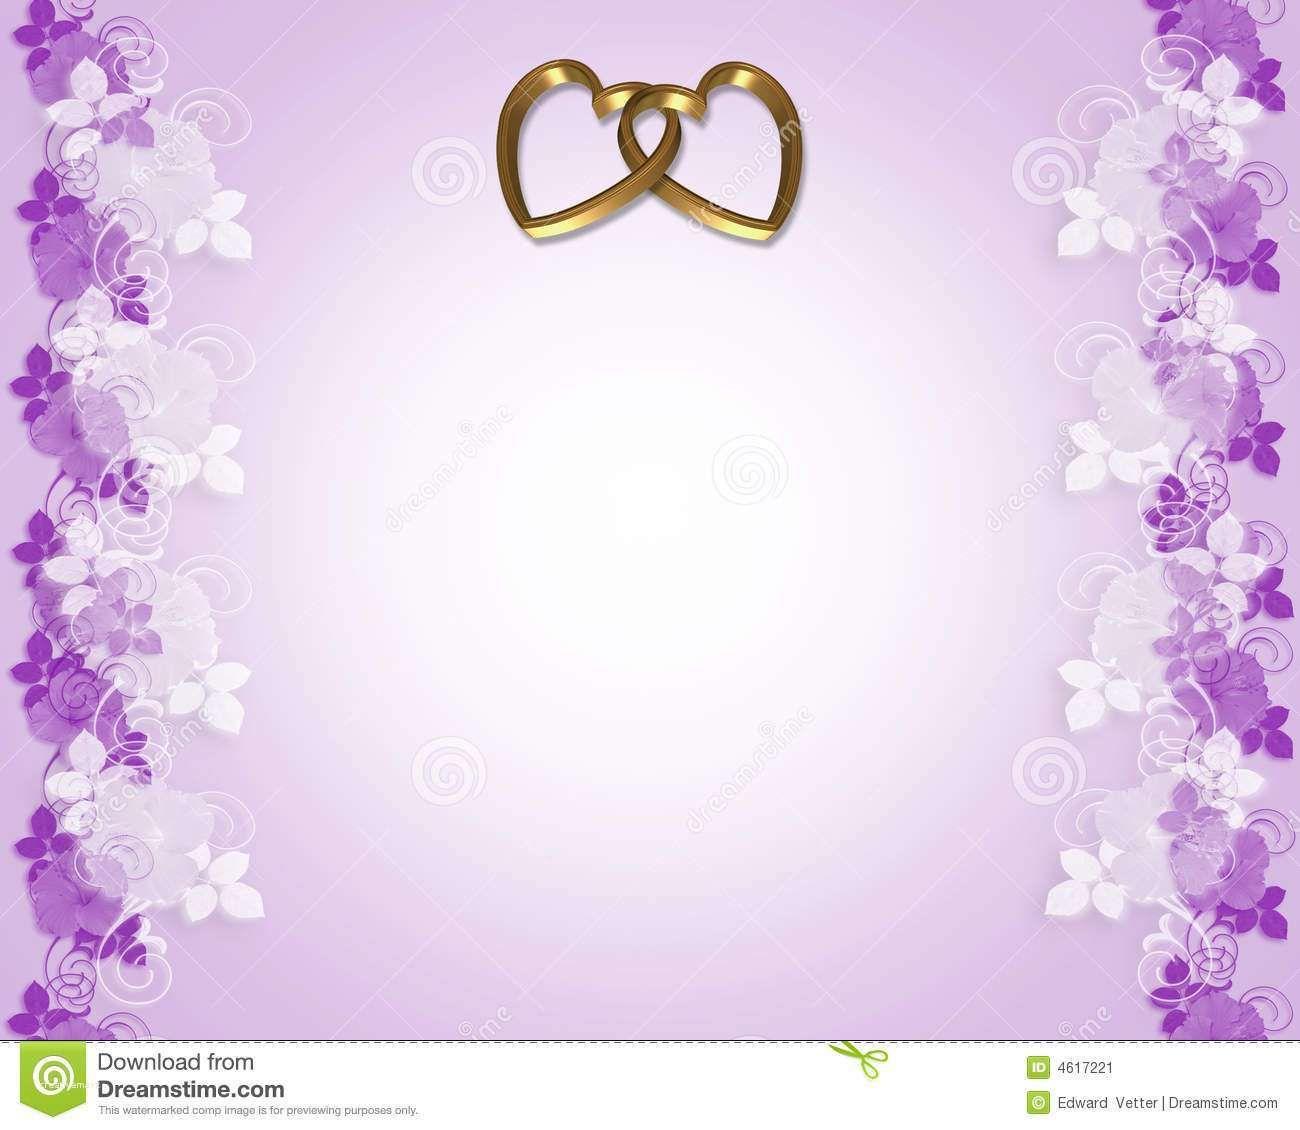 Fresh Wedding Invitation Background Designs Free Download ...